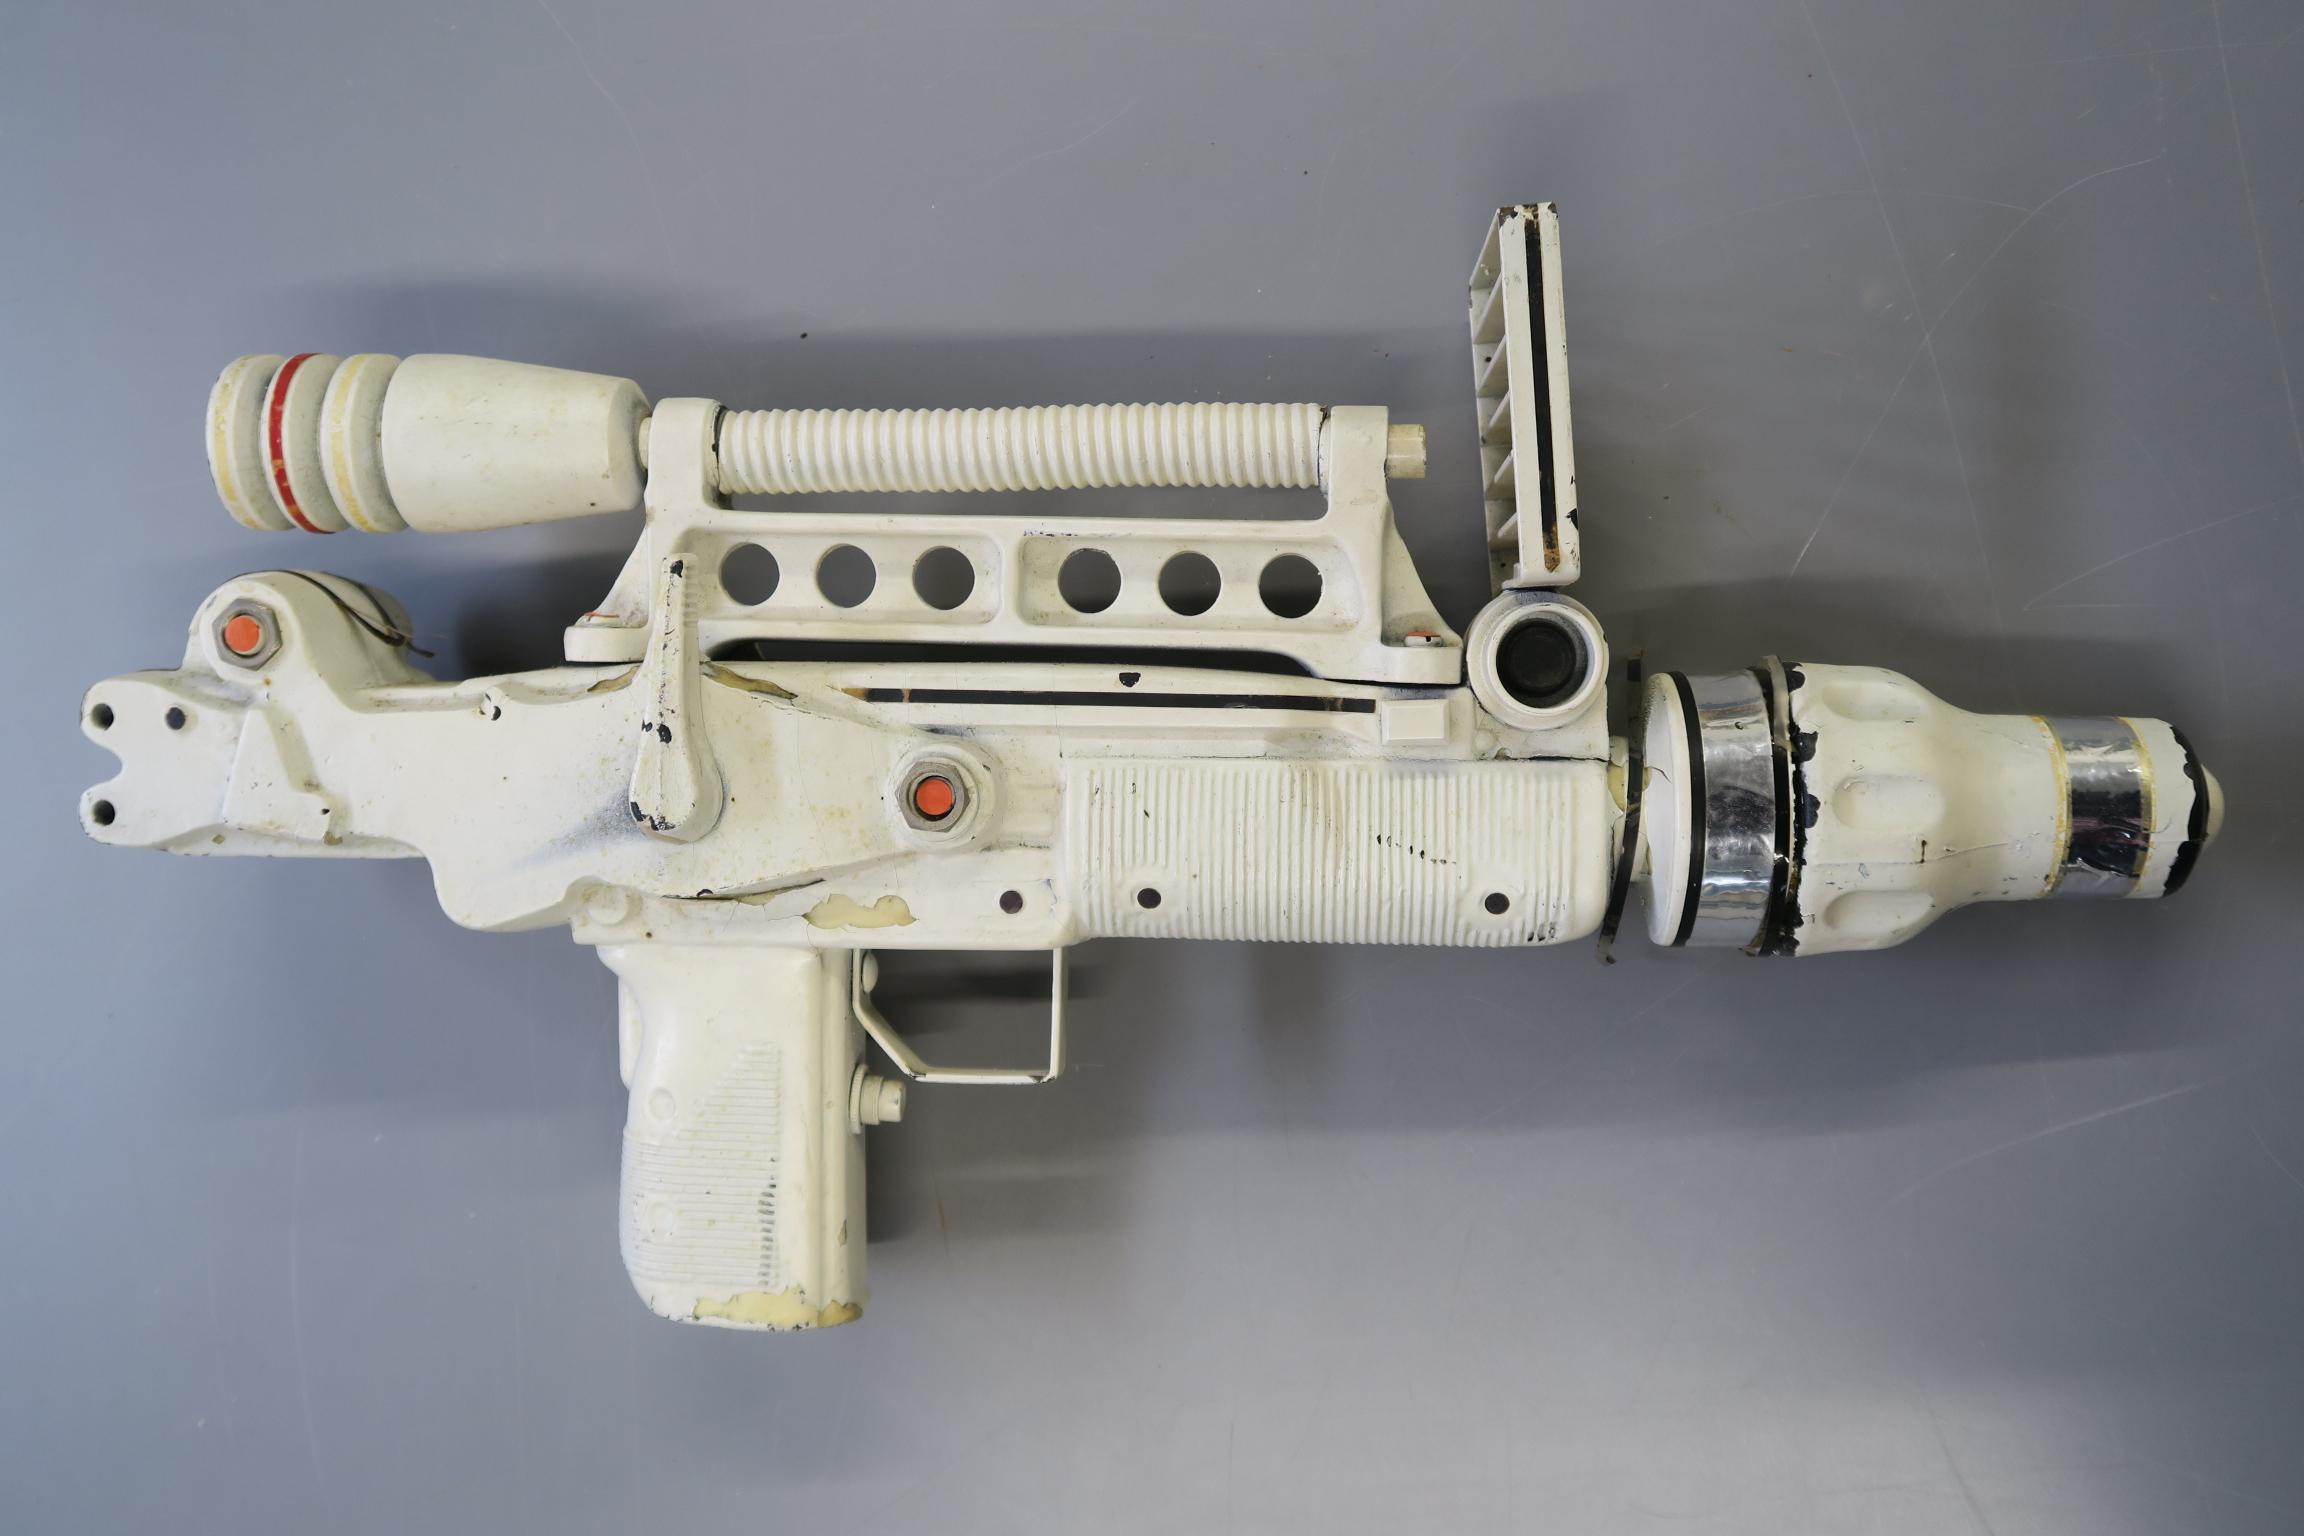 JAMES BOND 007 : Moonraker laser rifle created especially for this futuristic James Bond 1979 film.